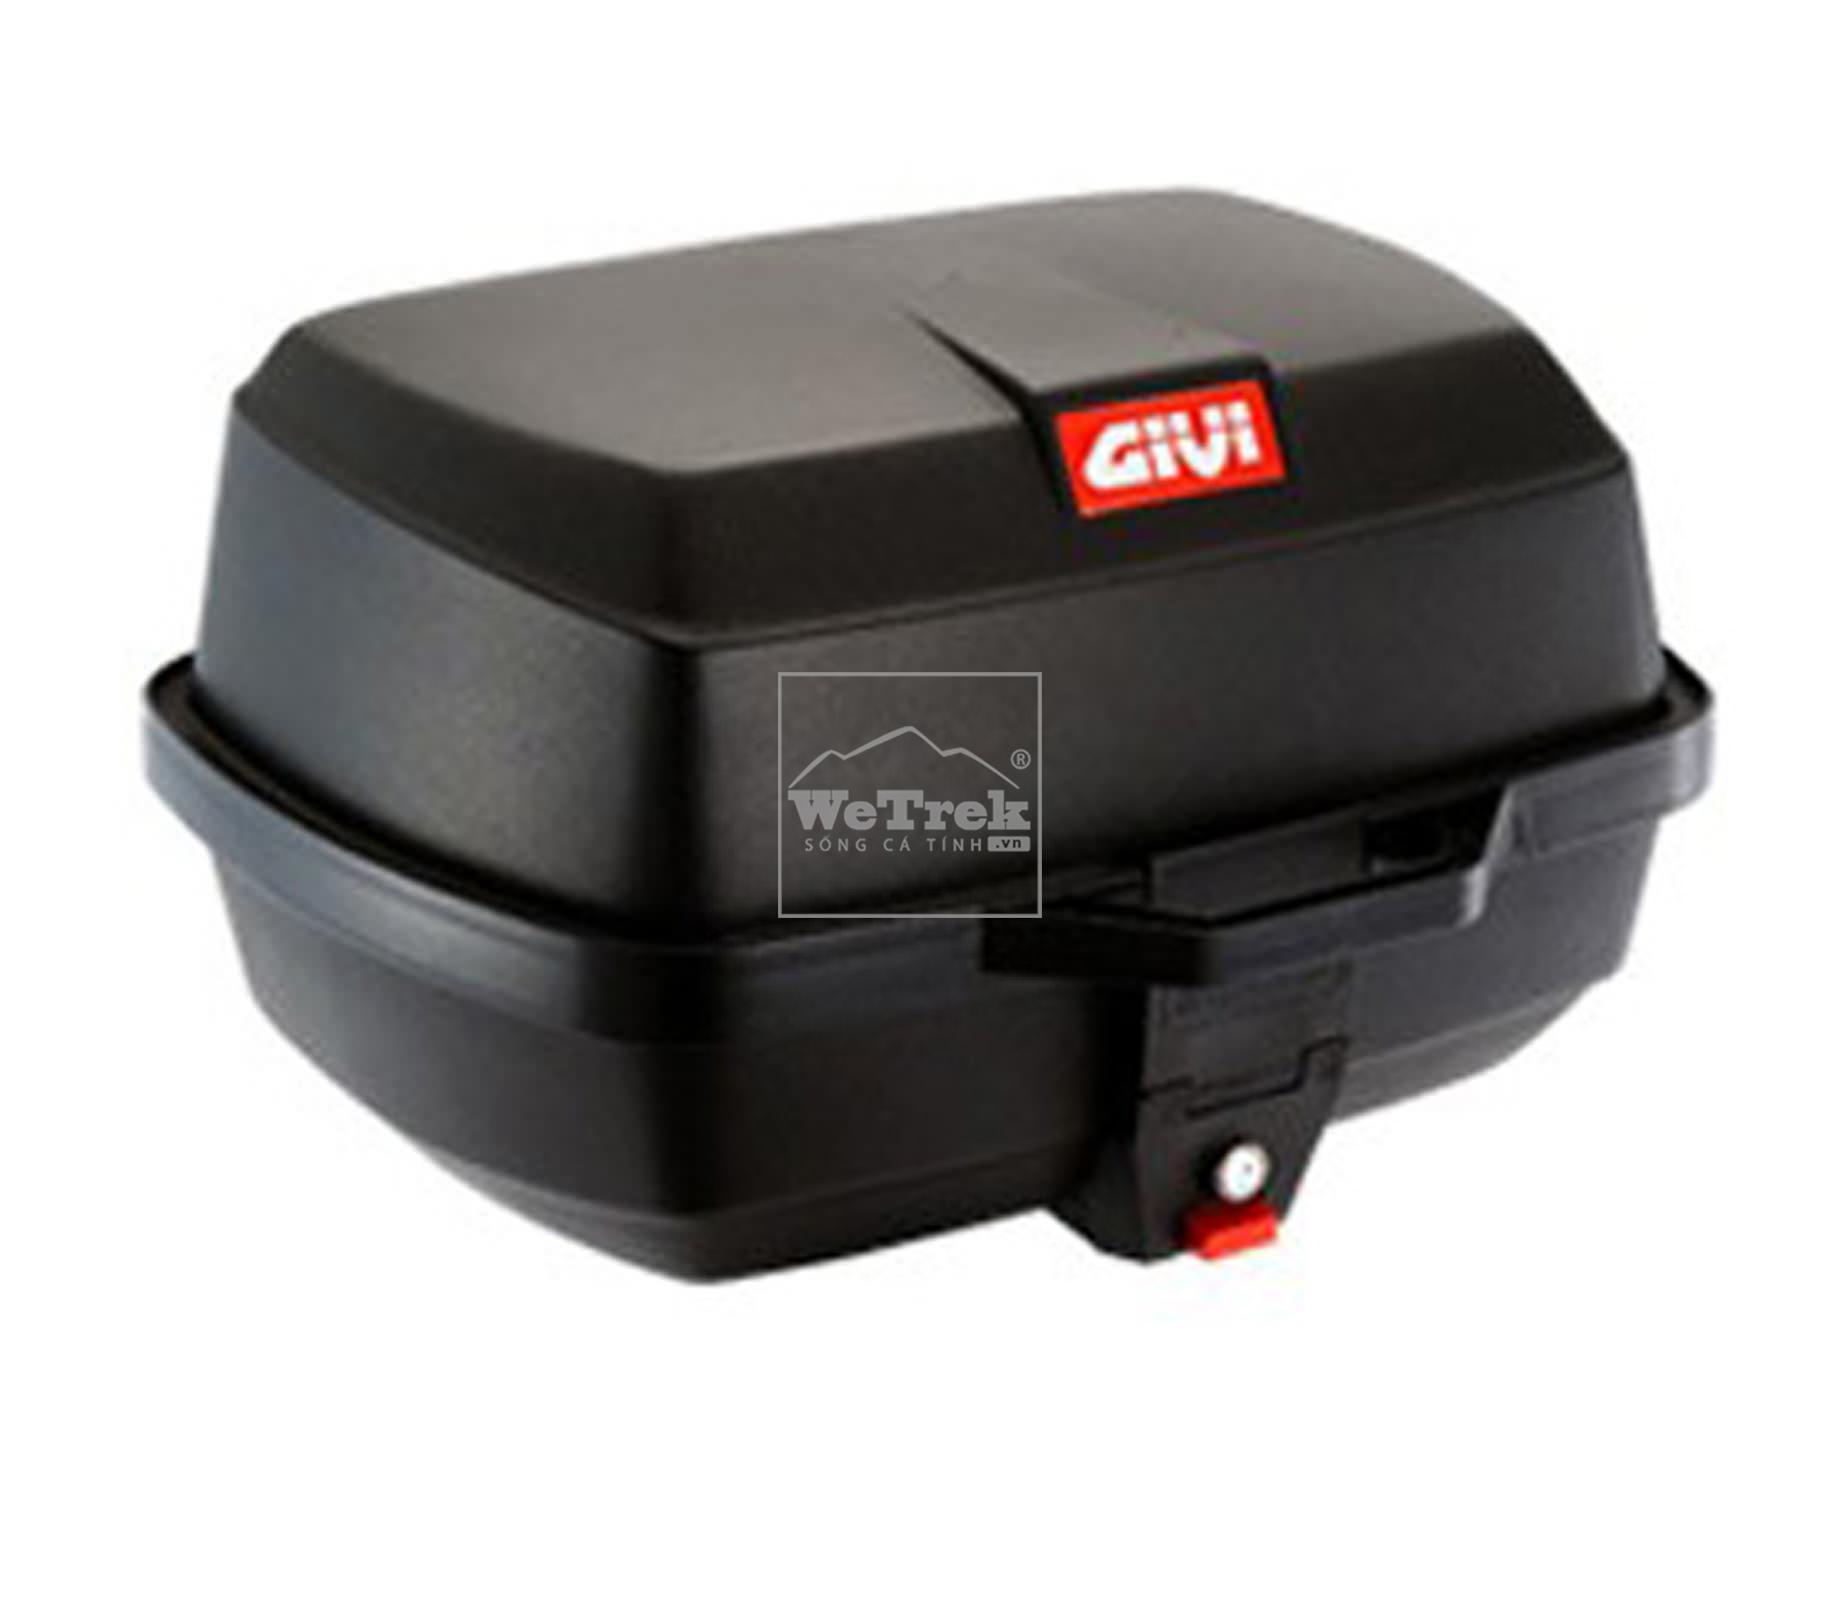 Thùng sau xe máy GIVI E20N Easy - Đen - 5361